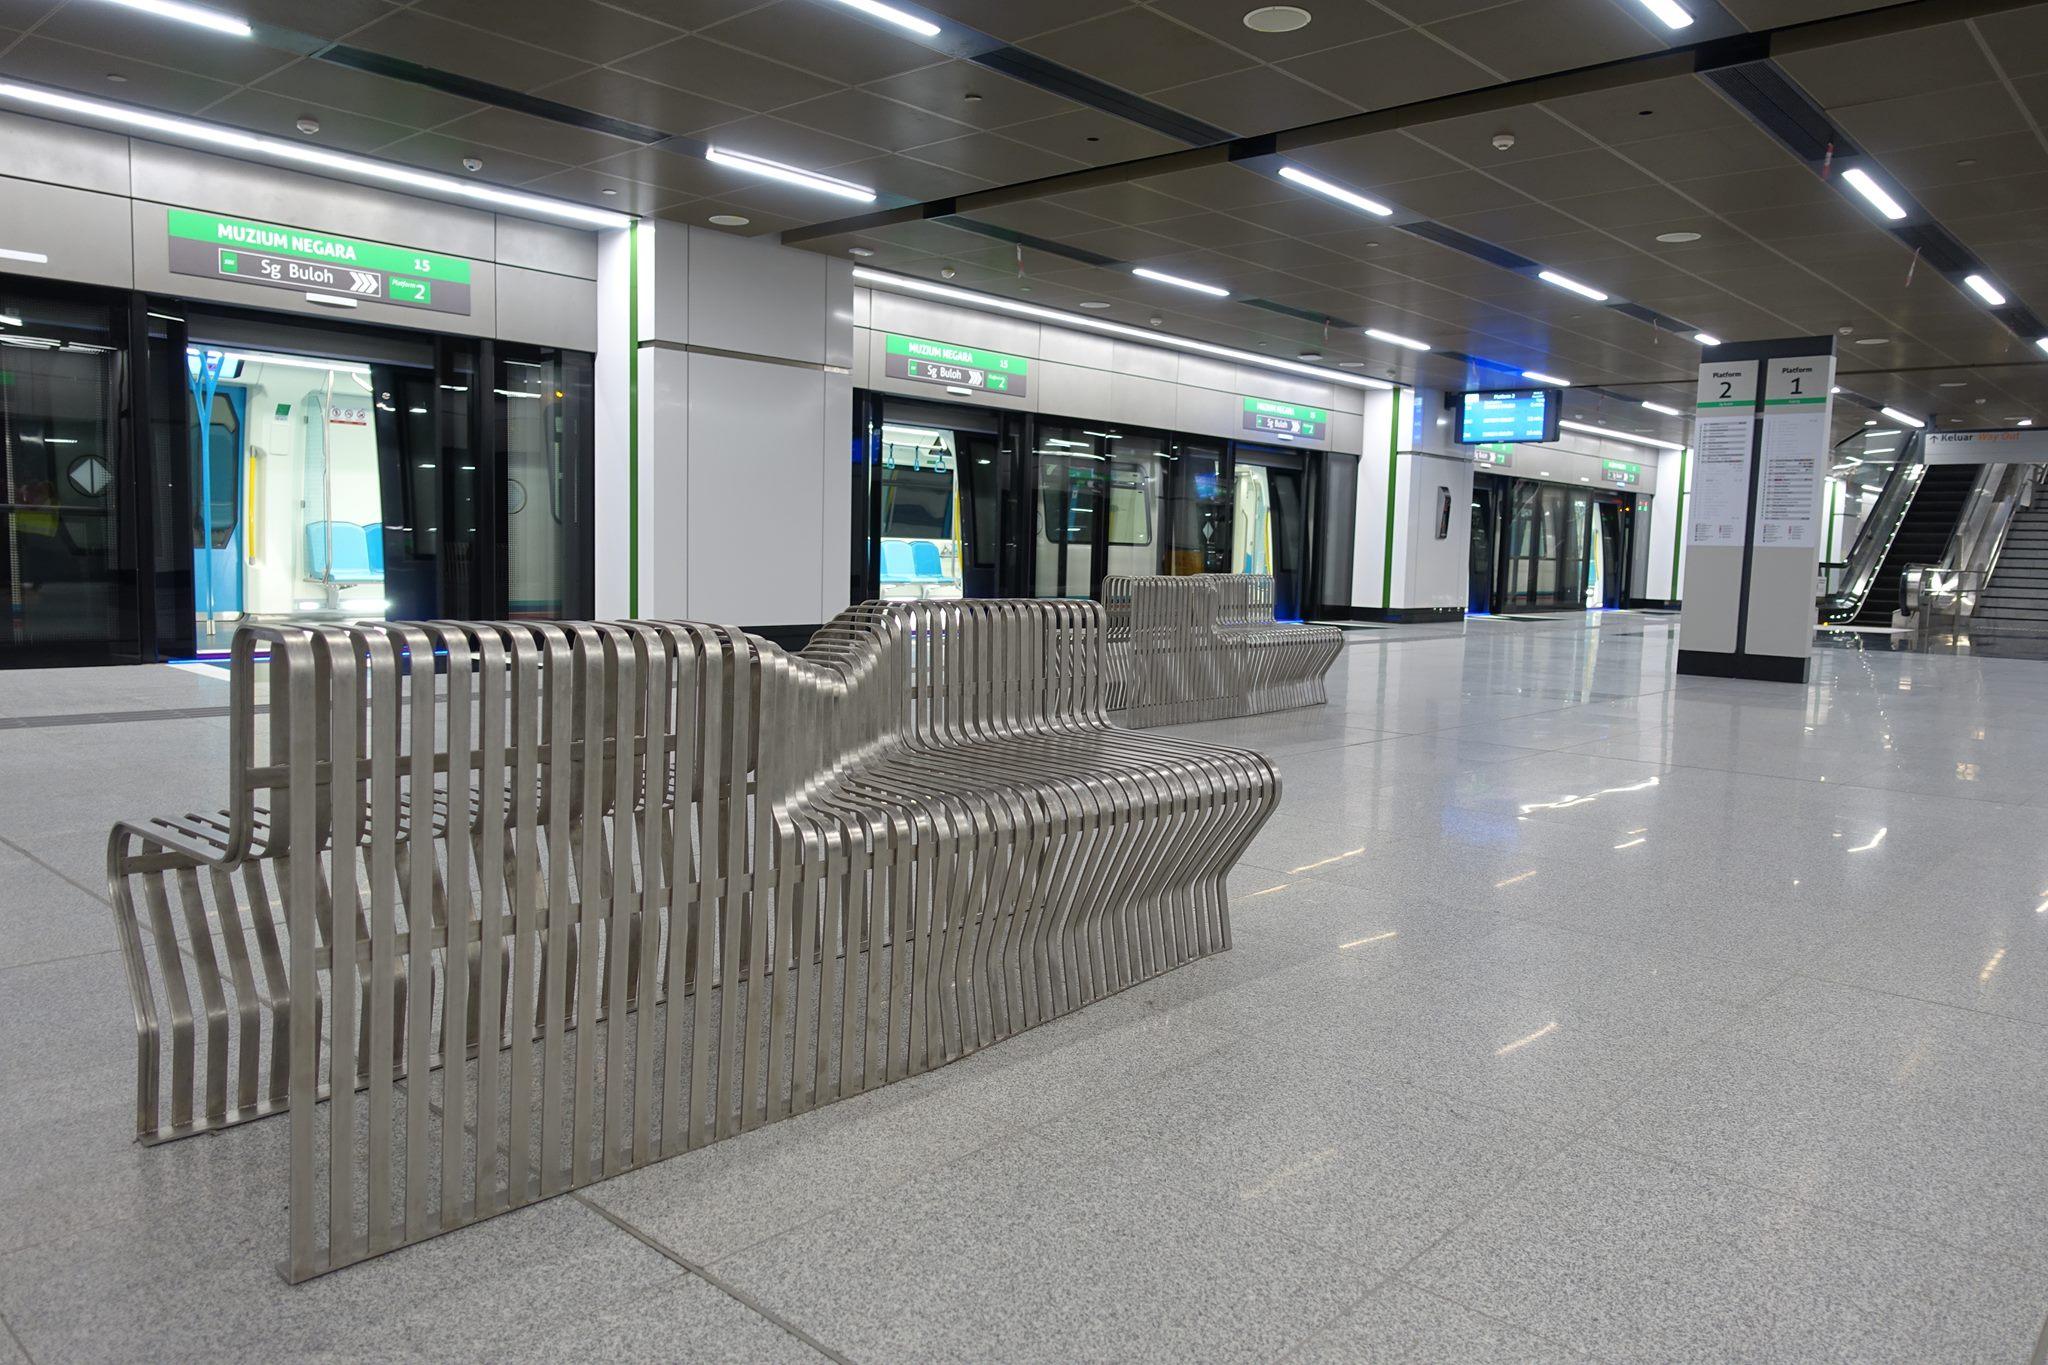 Image from MRT Malaysia